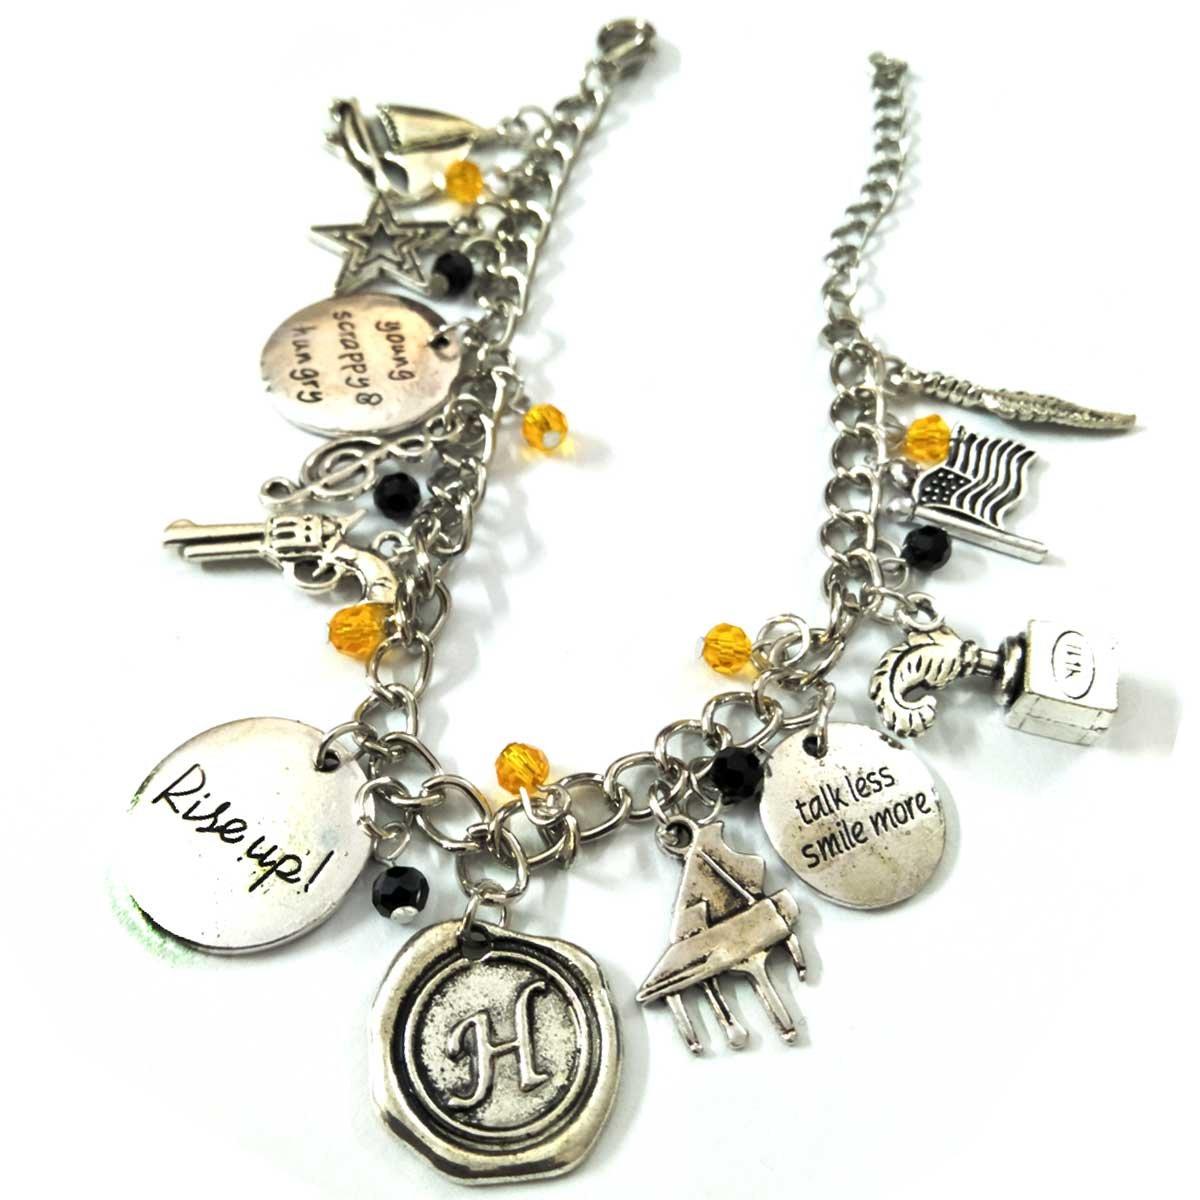 Hamilton Charm Bracelet for Women - Hamilton Merchandise Jewelry Gifts